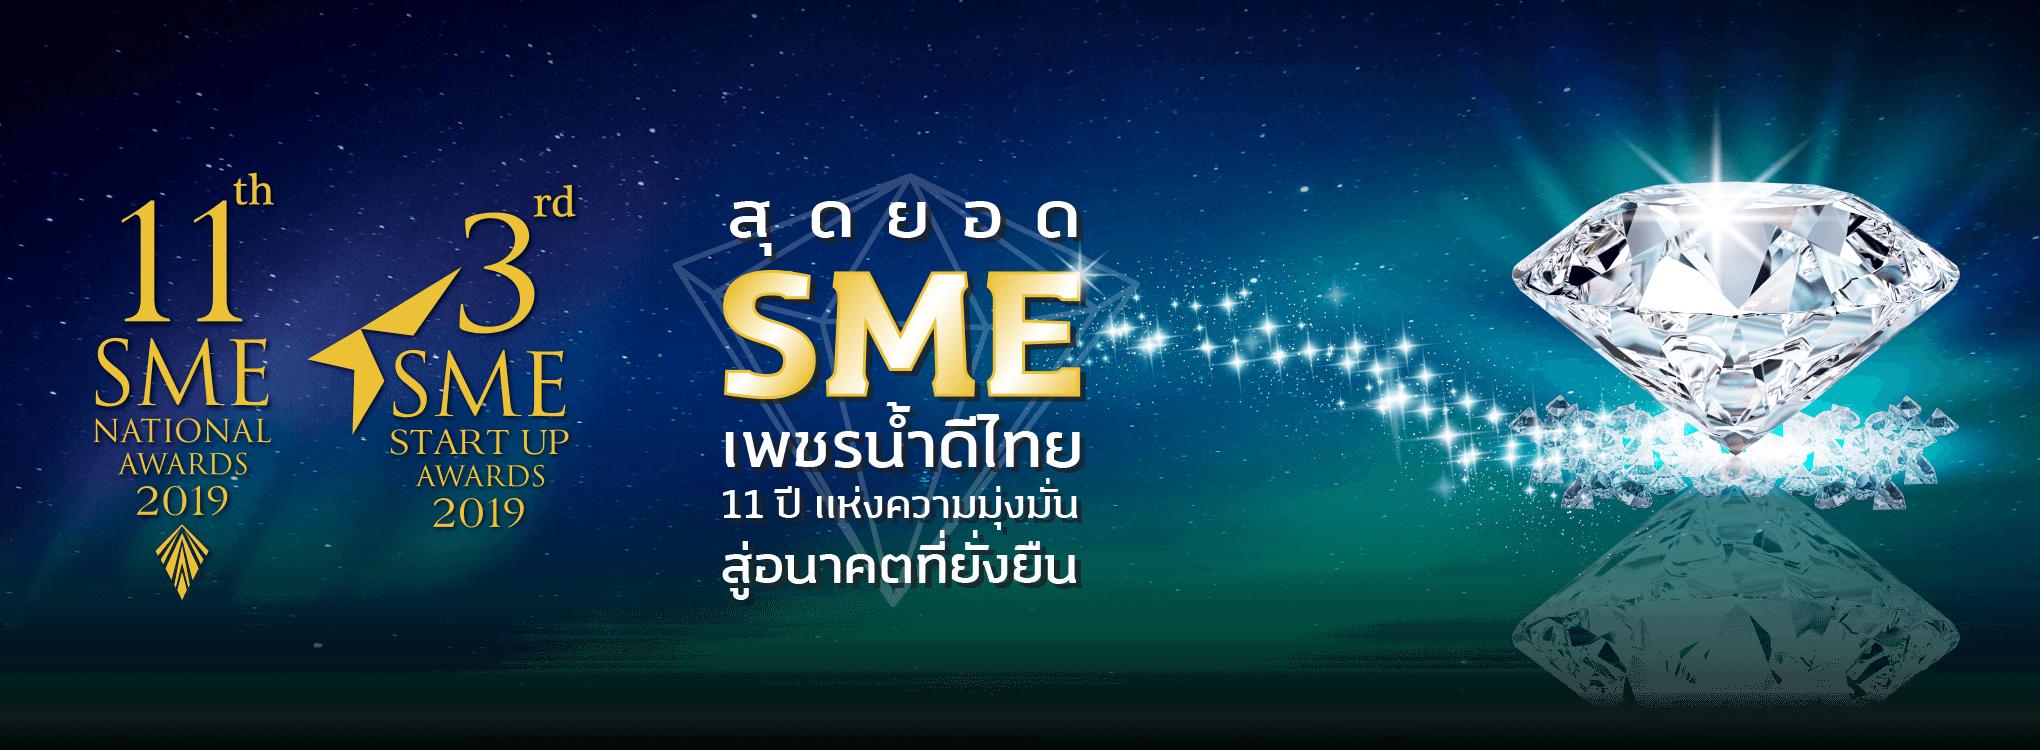 banner sme award